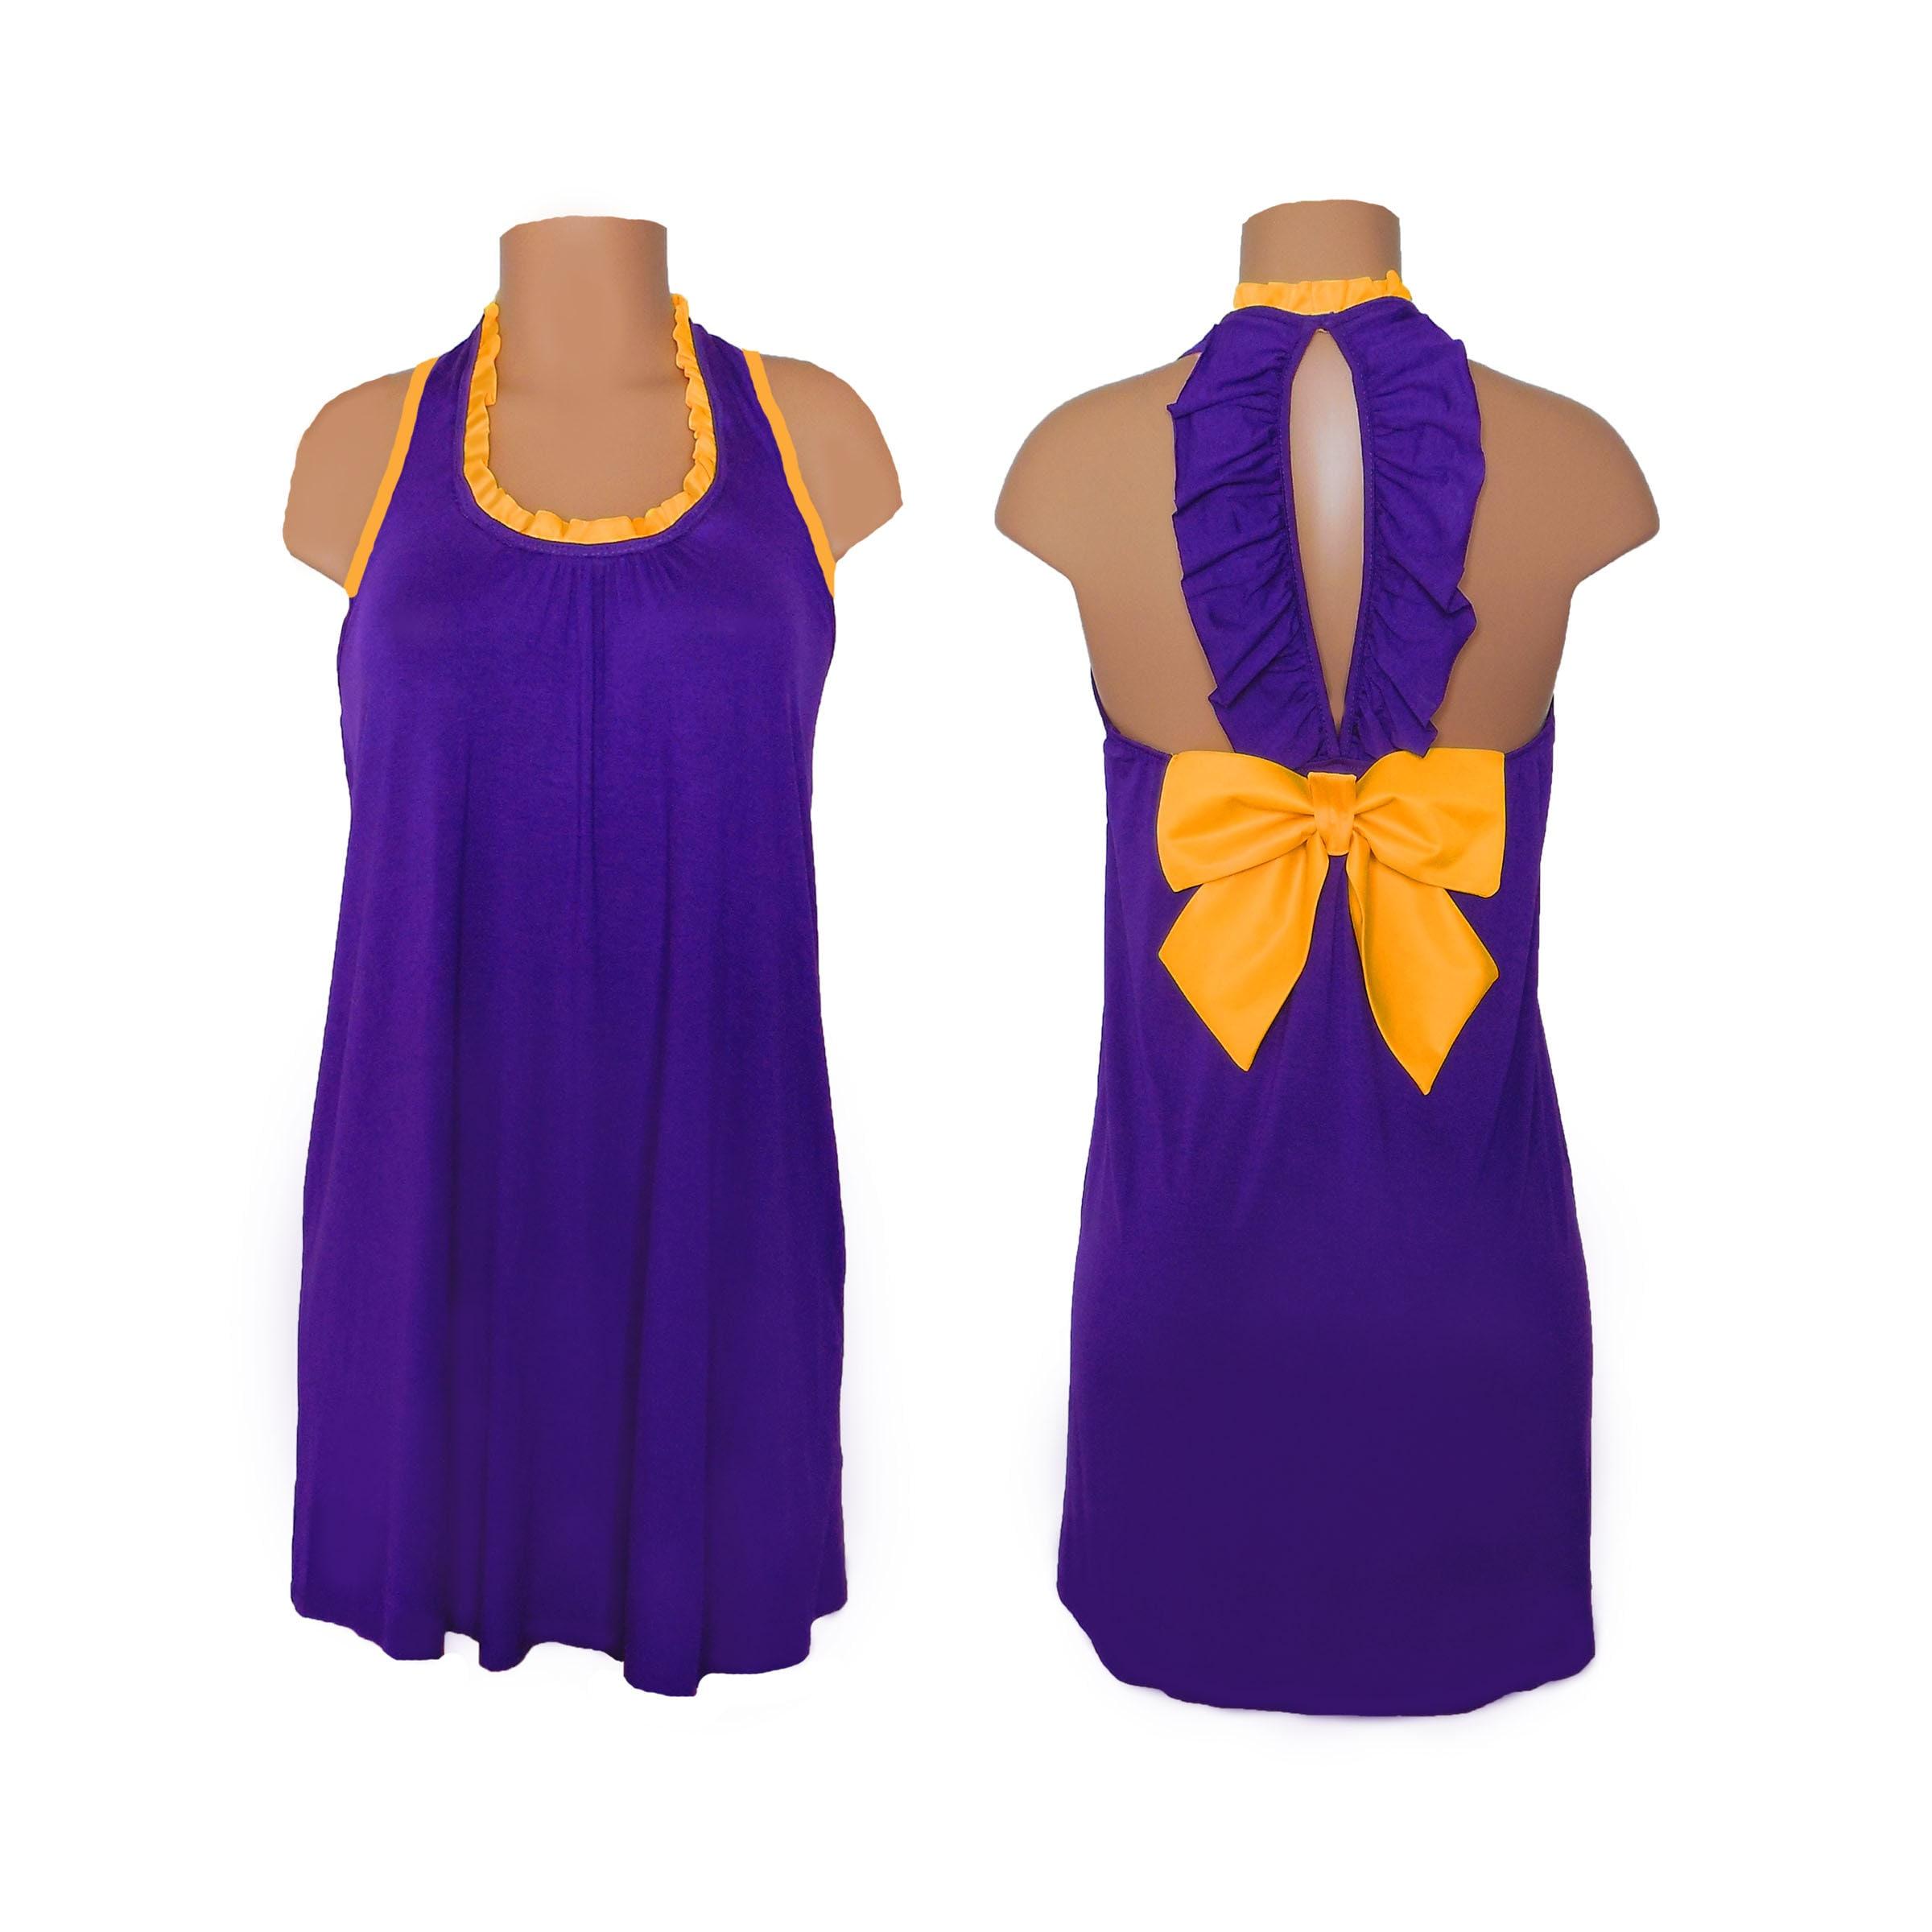 4e683d9dac98b Purple Bright Gold Back Bow Dress